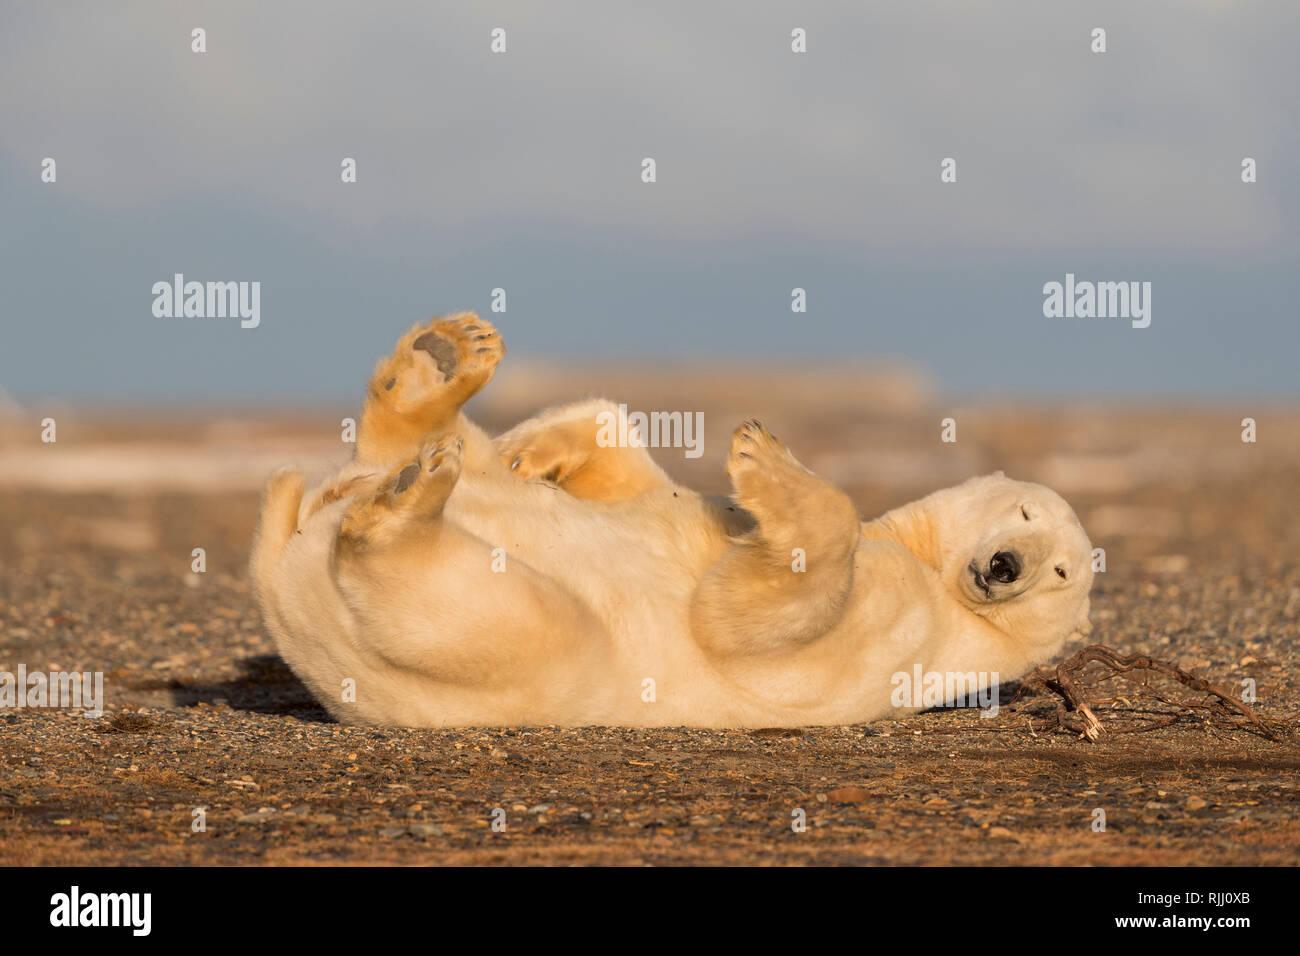 Polar Bear (Ursus maritimus, Thalarctos maritimus). Cub playing. Kaktovik, Alaska. - Stock Image